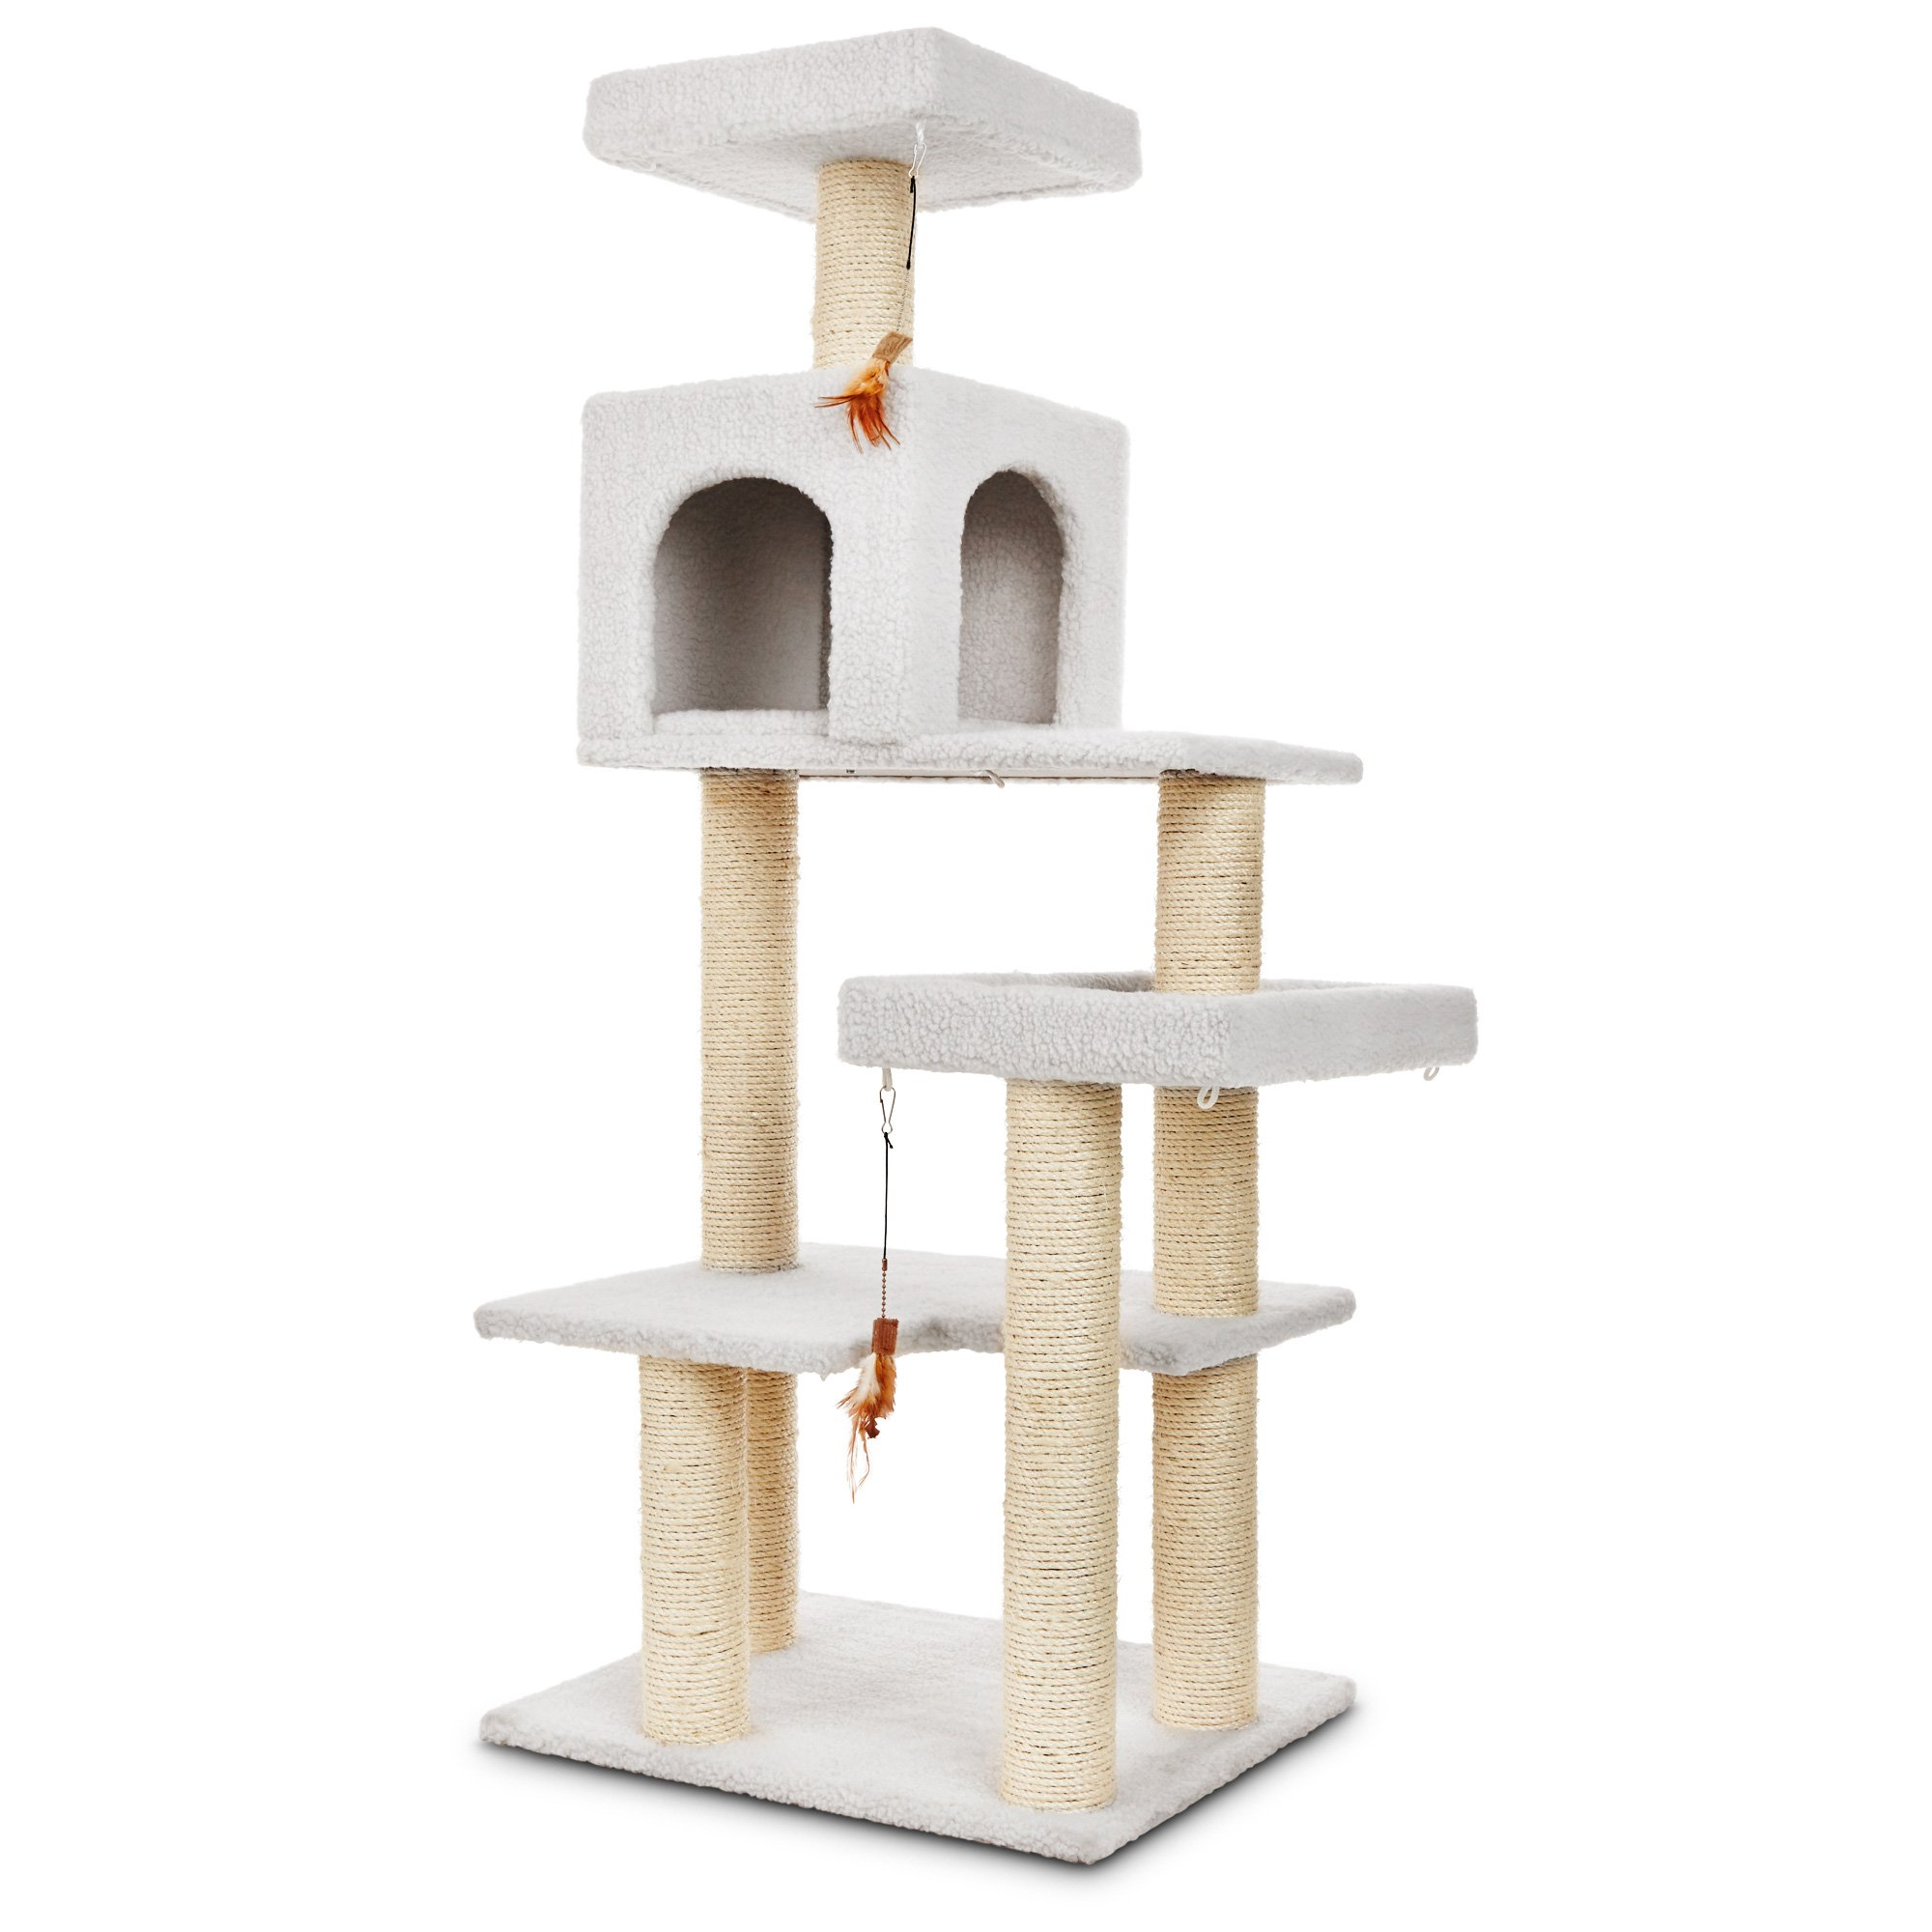 You & Me Scratch & Snooze Station Cat Tree